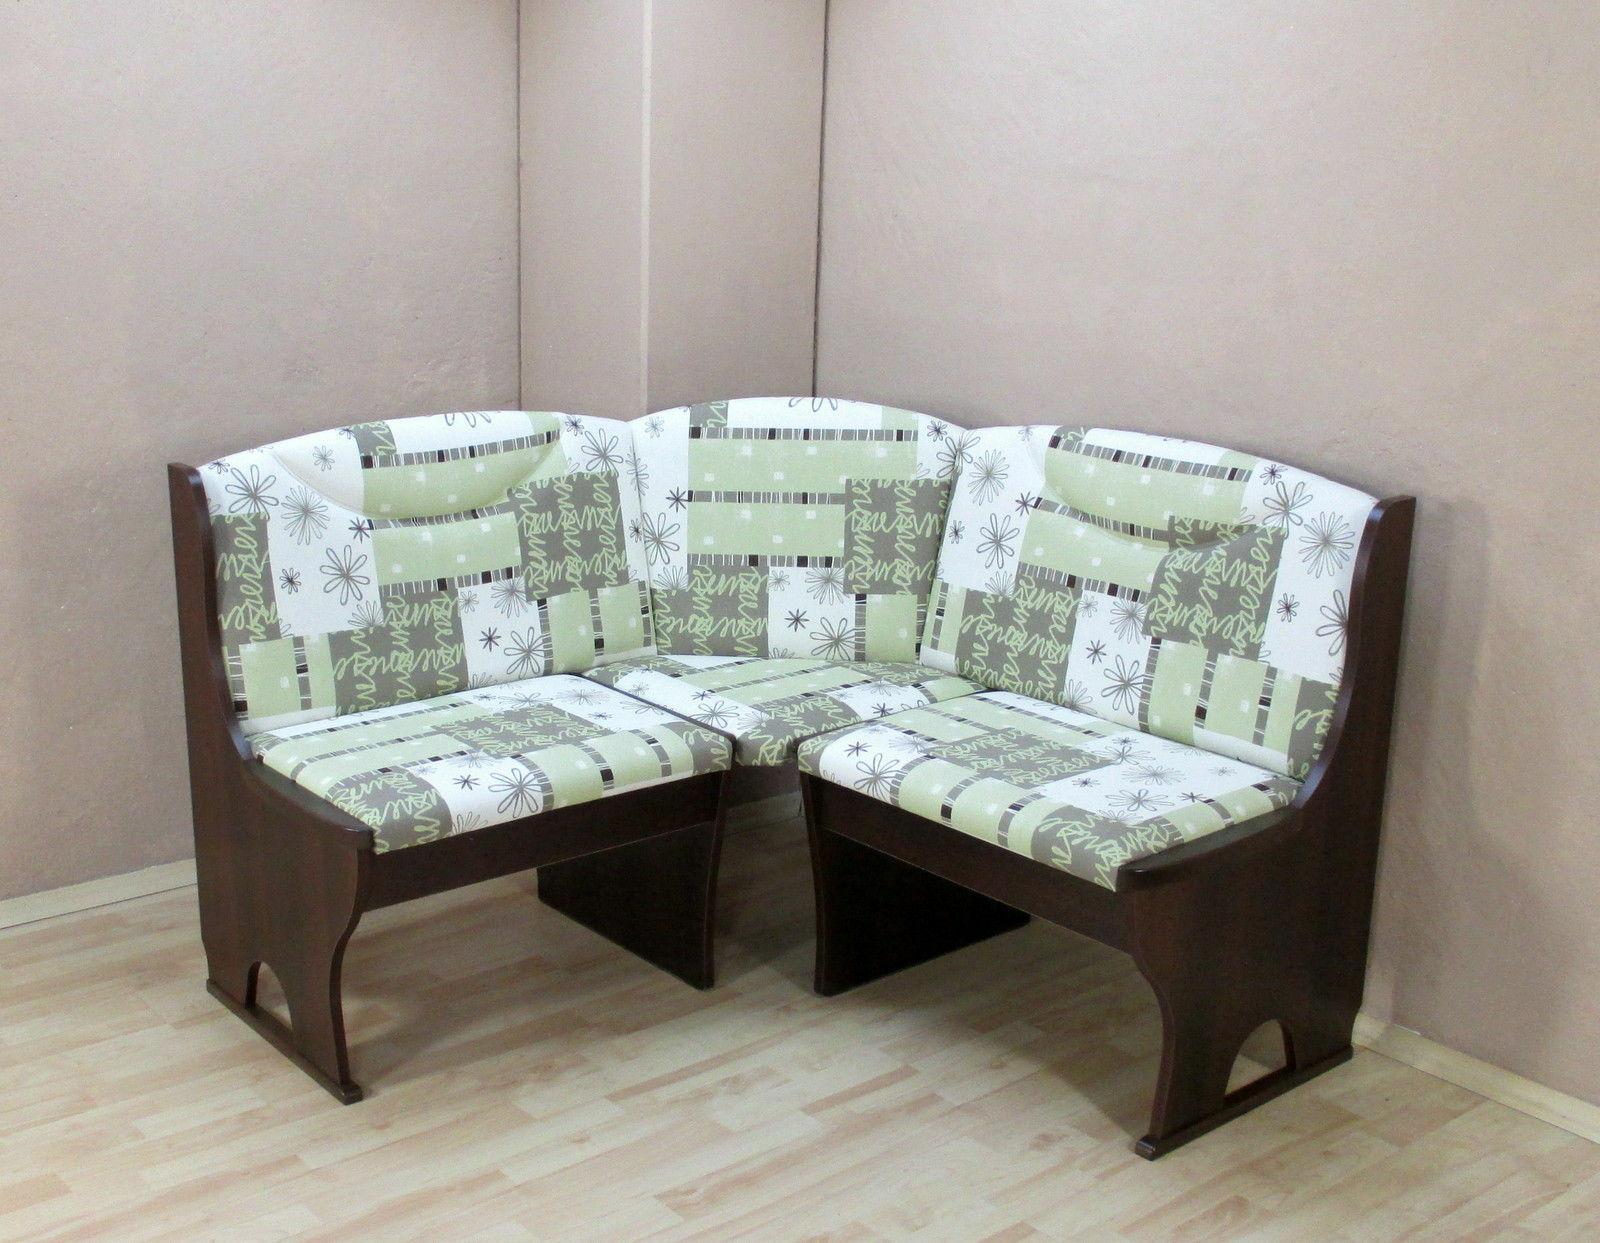 Cheap Moderne Nussbaum Creme Olive Teil Massiv Sitzgruppe With Moderne  Esszimmer Bank